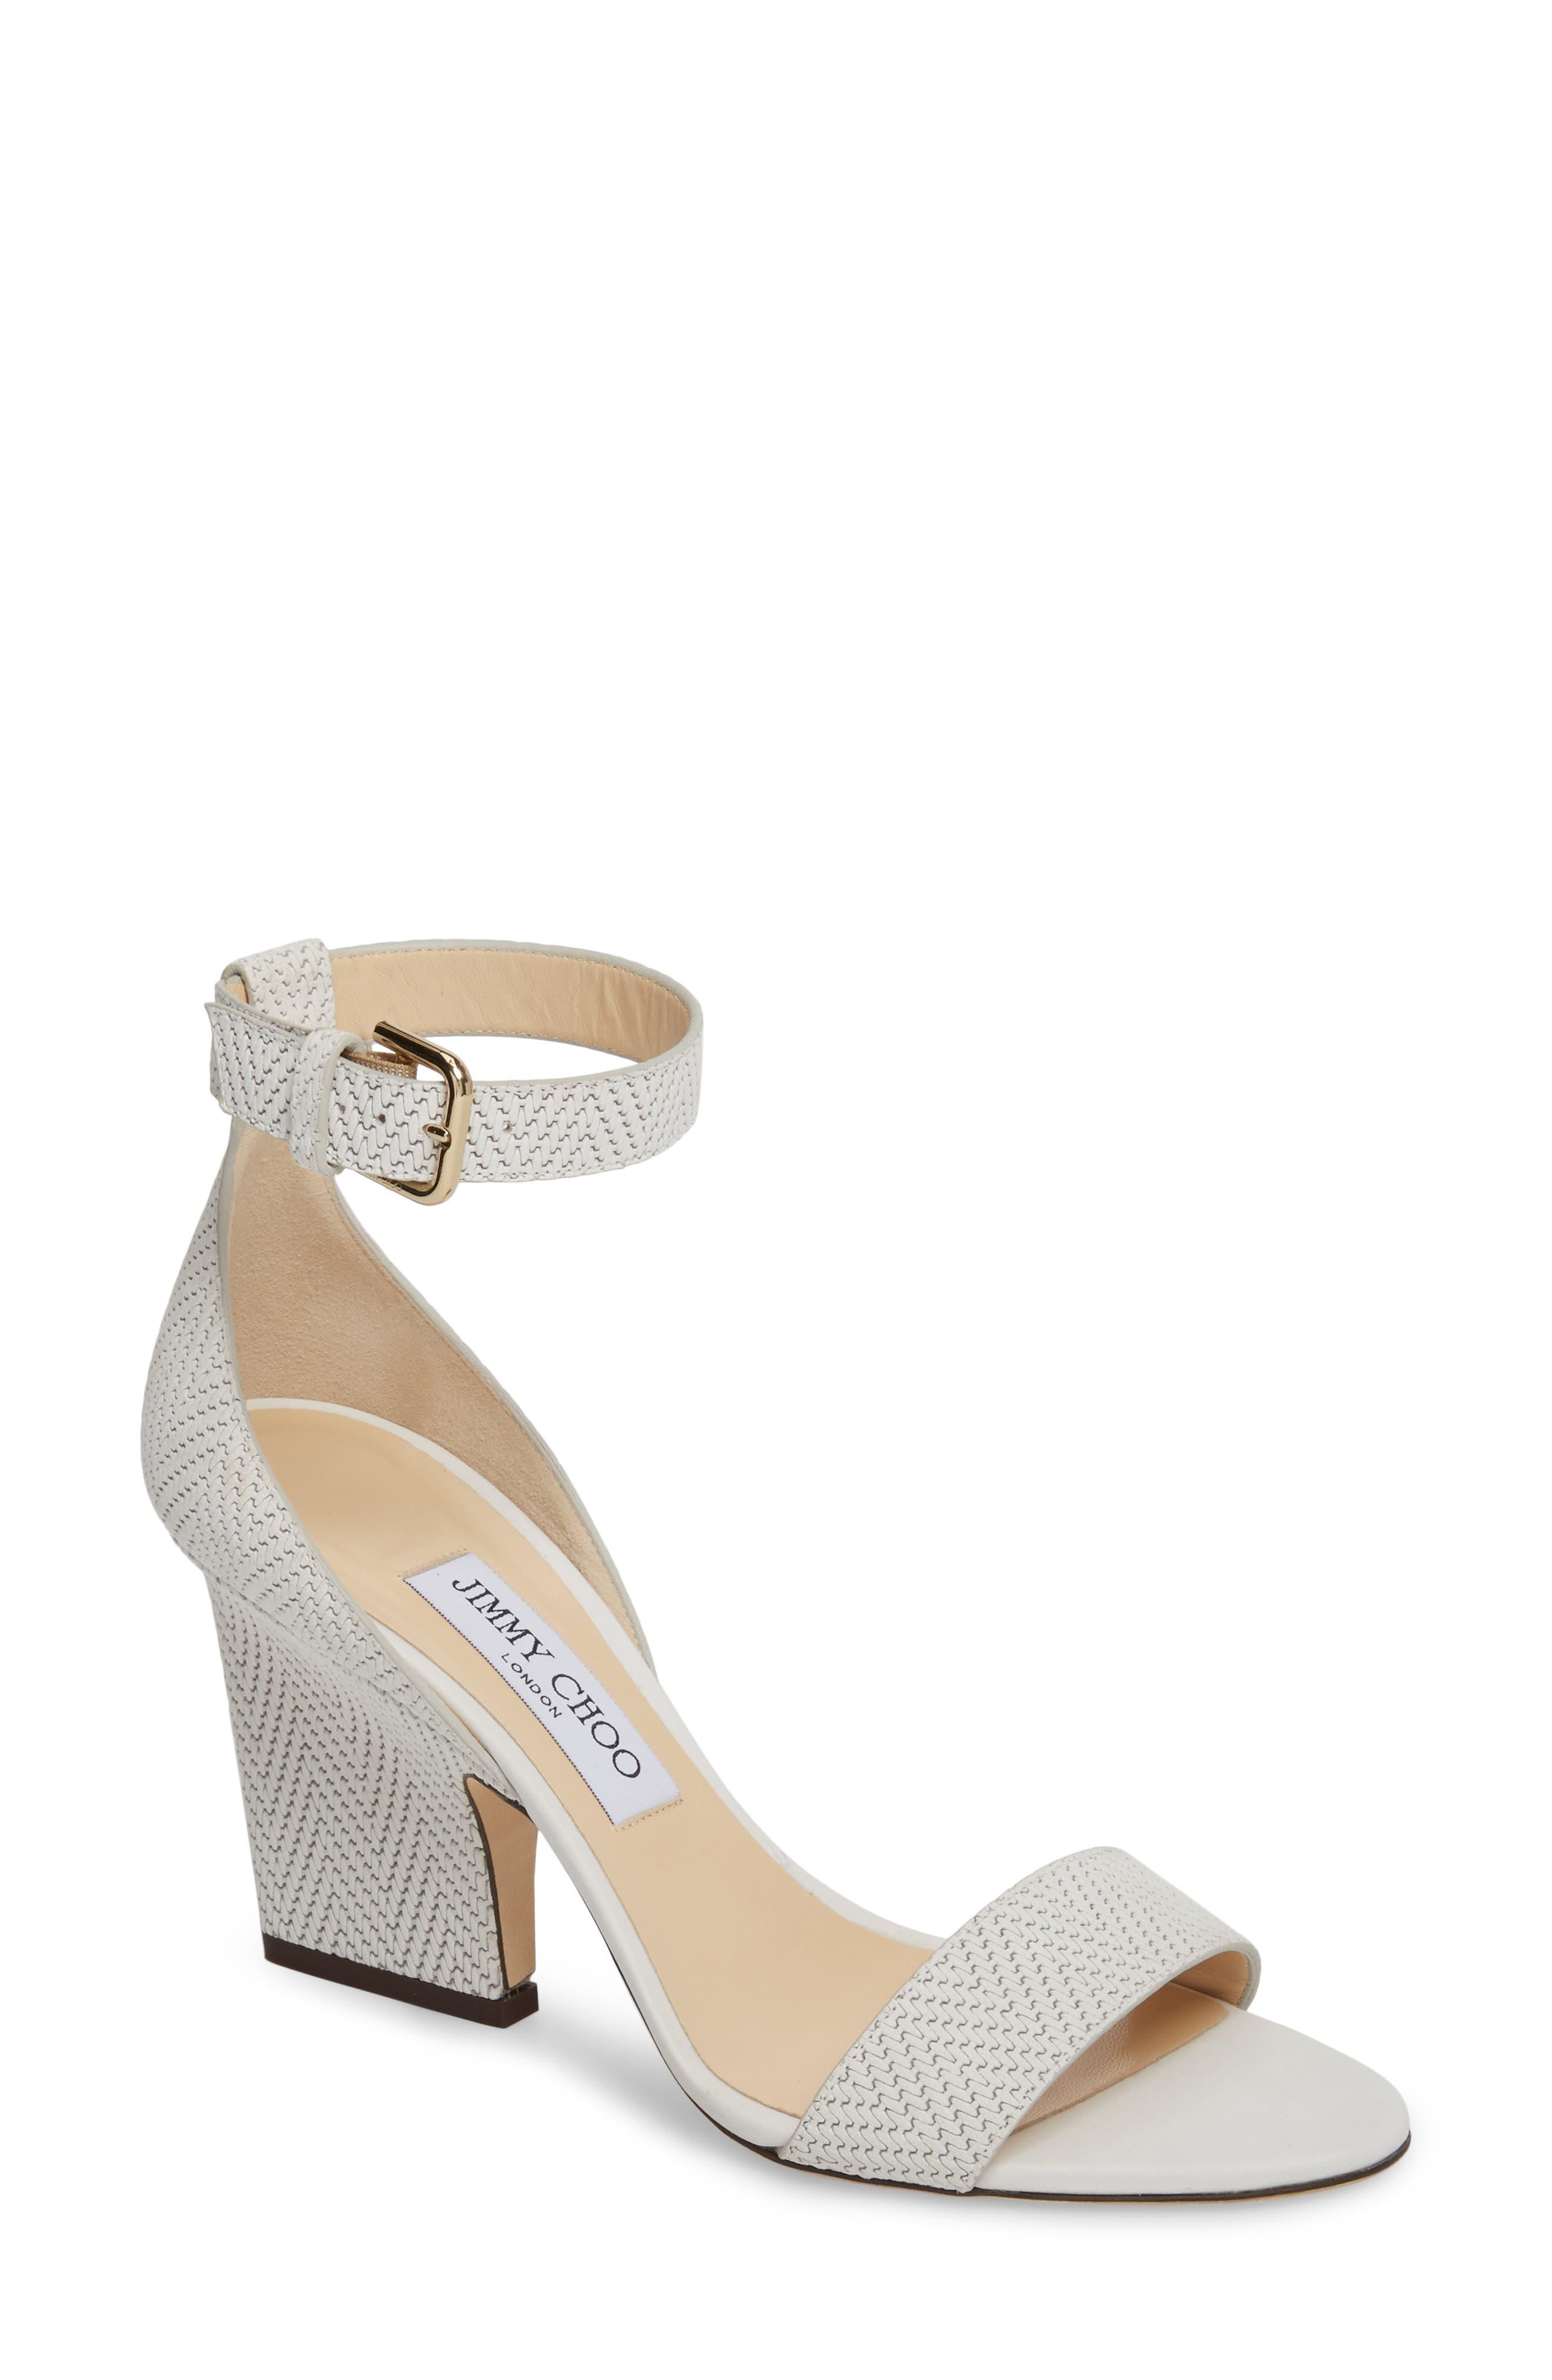 Main Image - Jimmy Choo Edina Ankle Strap Sandal (Women)